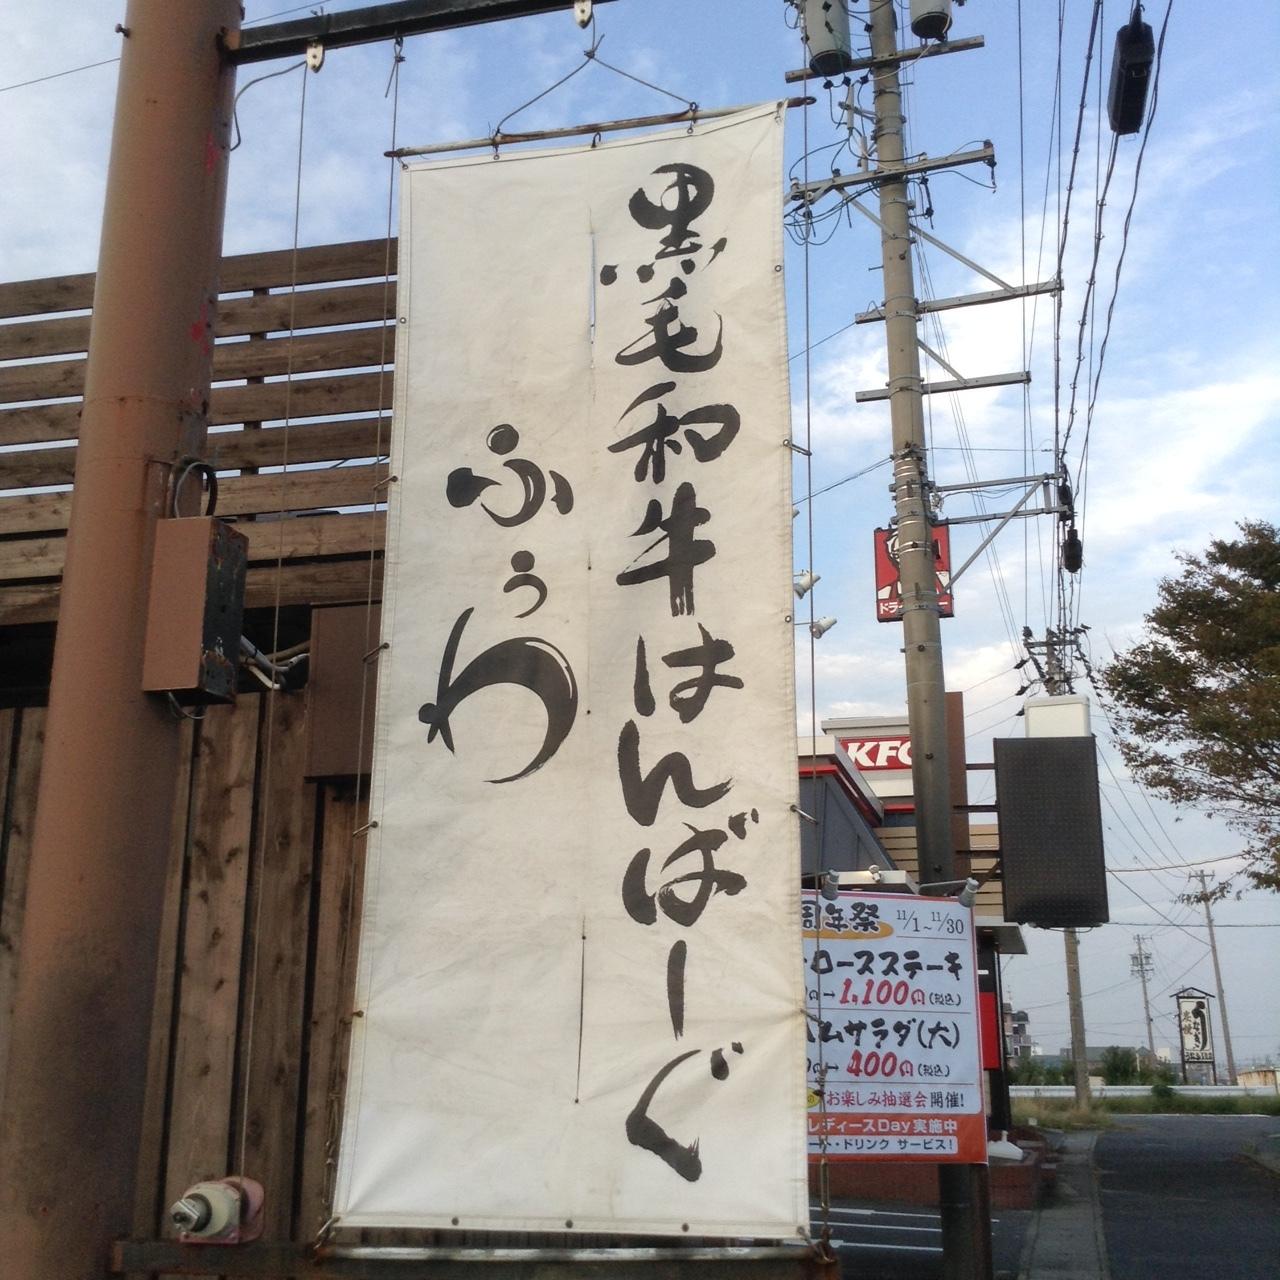 11-image2.jpg